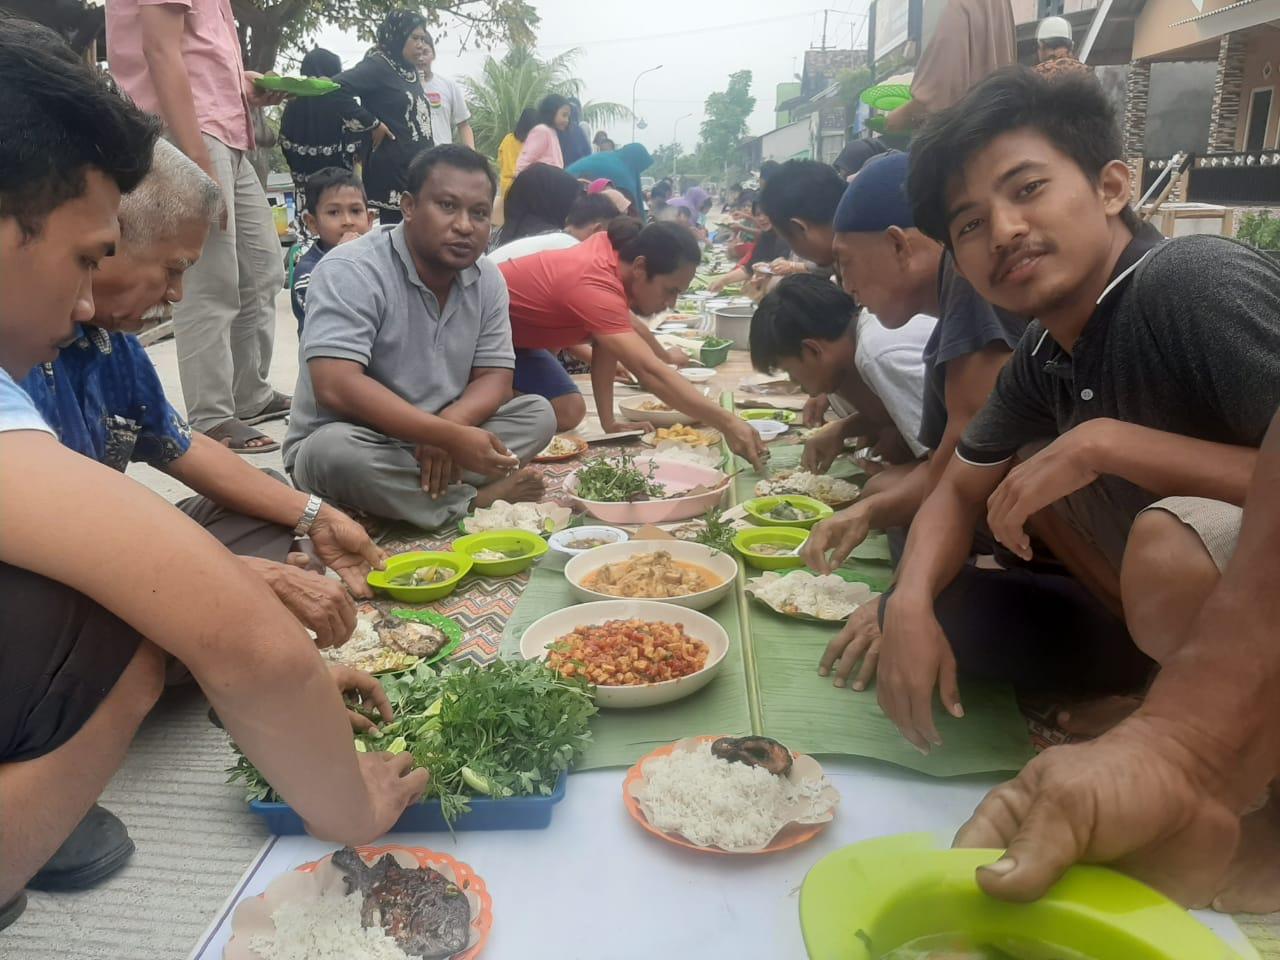 Sejak Indonesia Merdeka Tiga Generasi Warga di Kampung Karang Jaya Baru Bisa Merasakan Jalan Beton